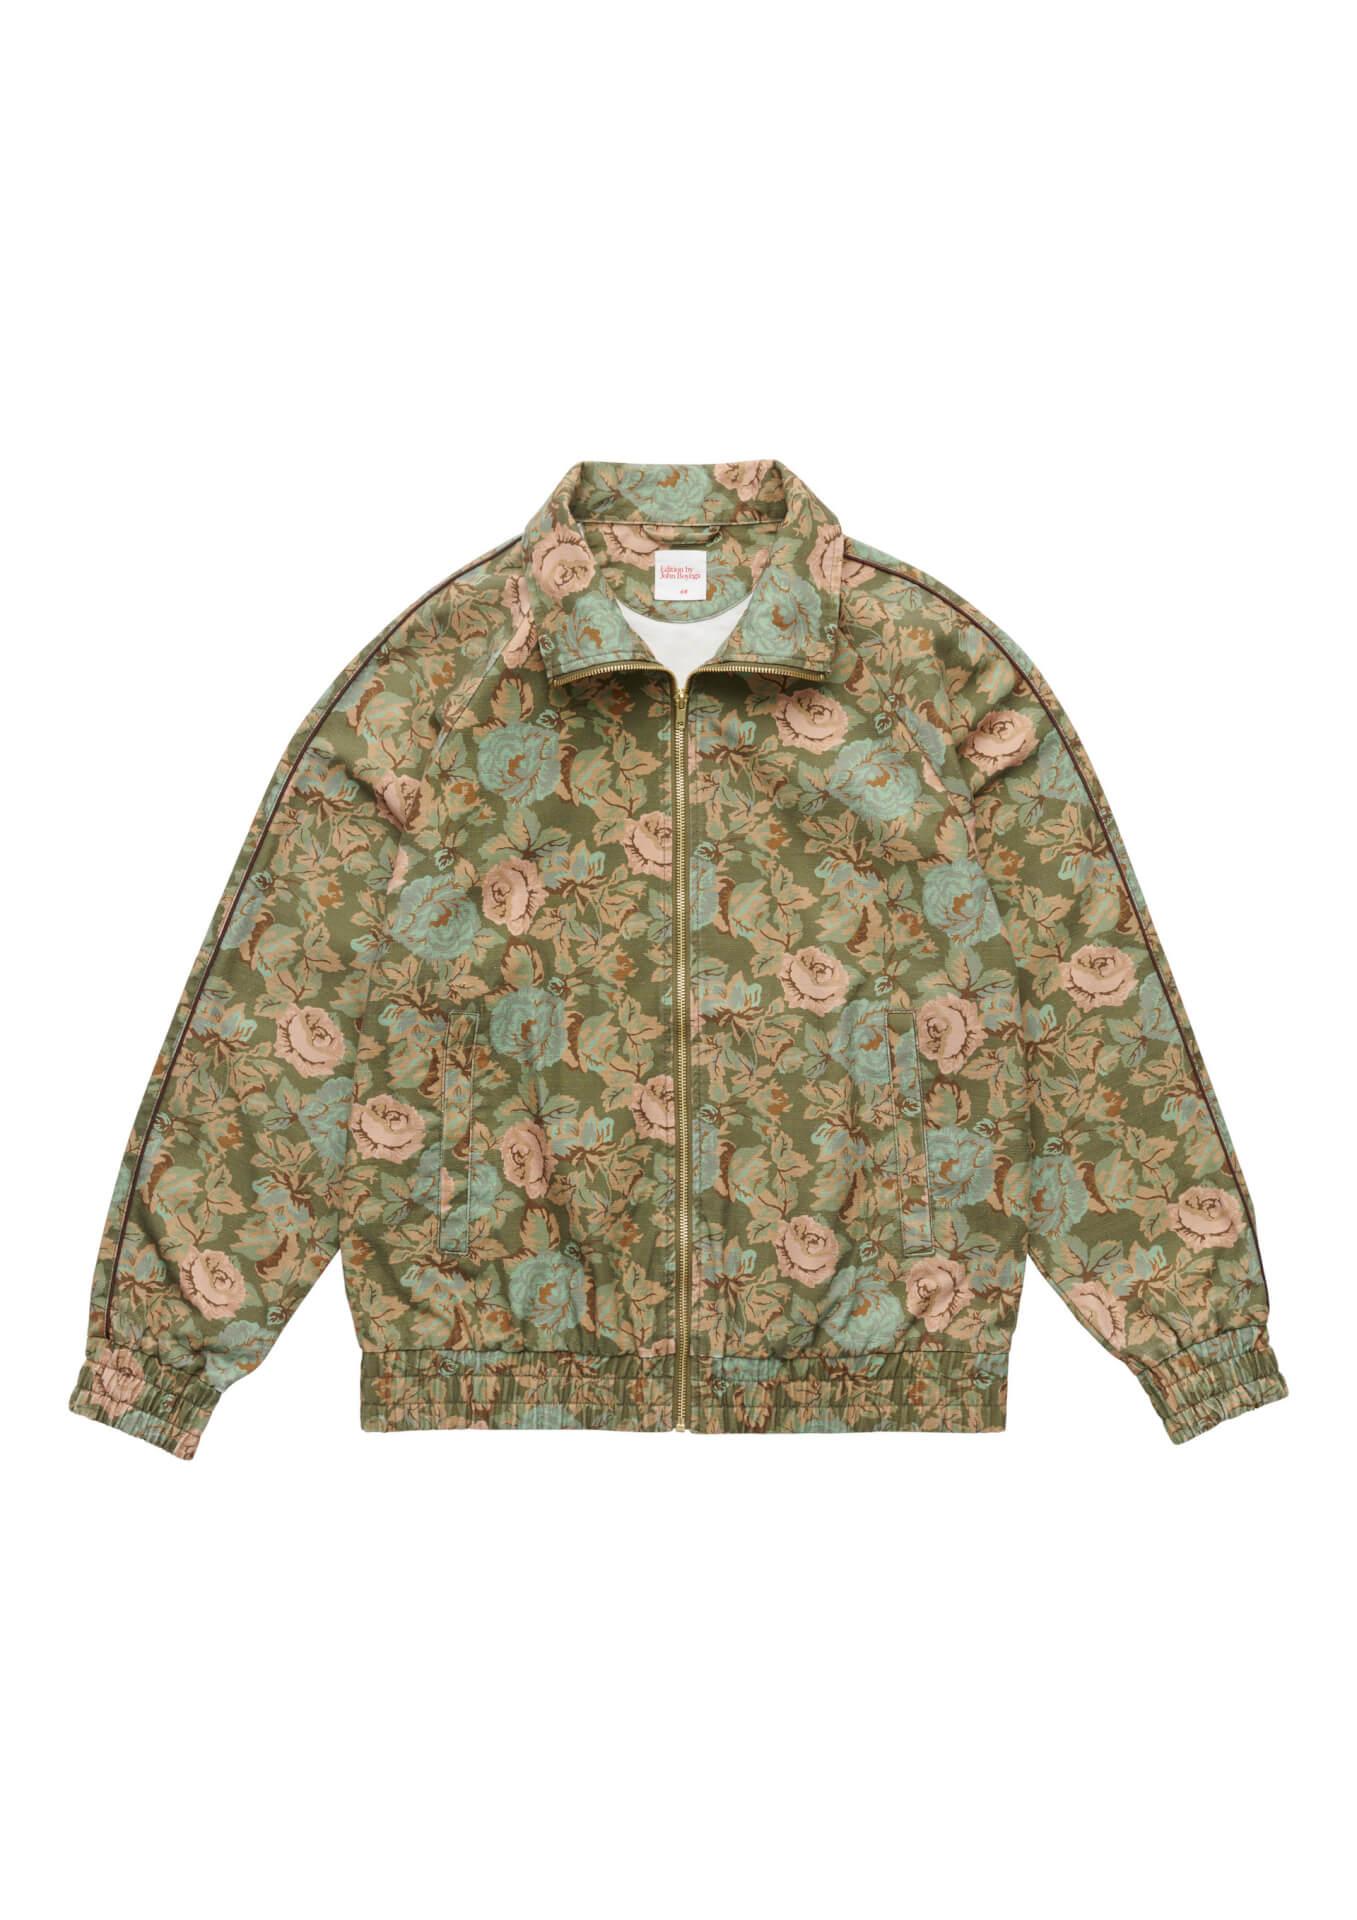 H&Mが俳優のジョン・ボイエガとタッグを組んだメンズウェアコレクションを発表!リサイクル素材、オーガニック素材を使用したアイテムが登場 life211006_handm_john_boyega_07